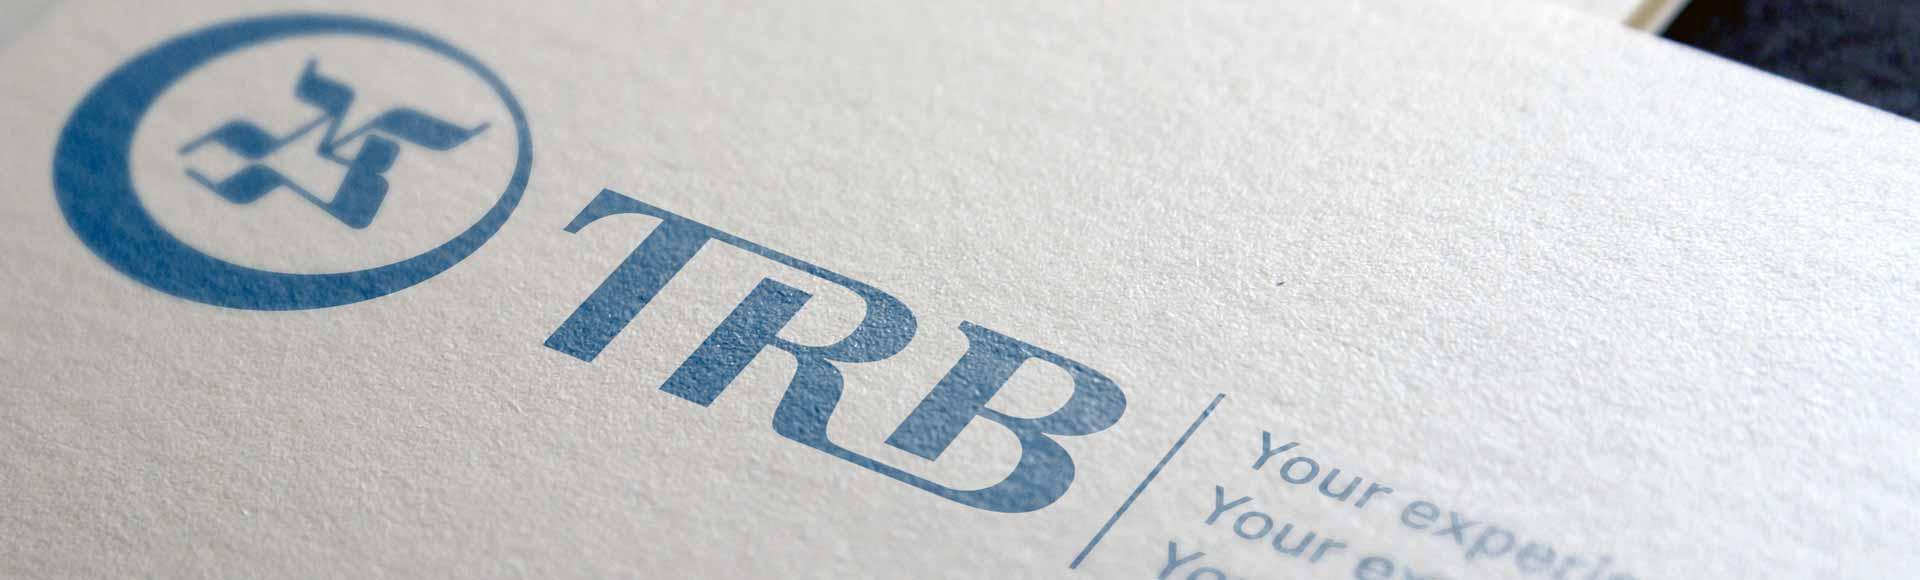 TRB-nouveau-logo-header-banner-1920x580